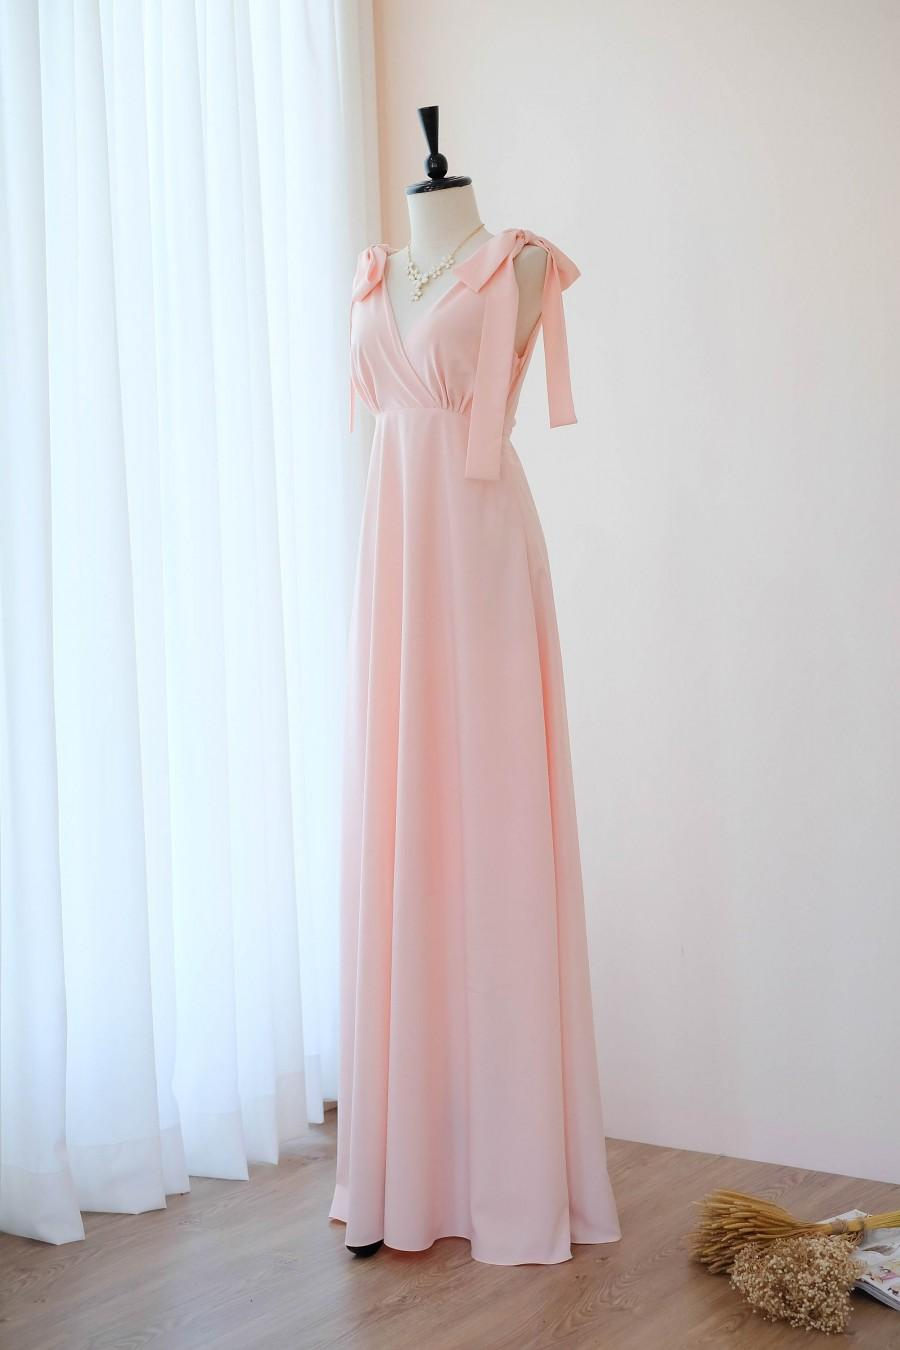 Wedding - Pink dress Pink blush bridesmaid dress floor length bright spring summer bridesmaid dress cocktail party wedding celebration vintage dresses